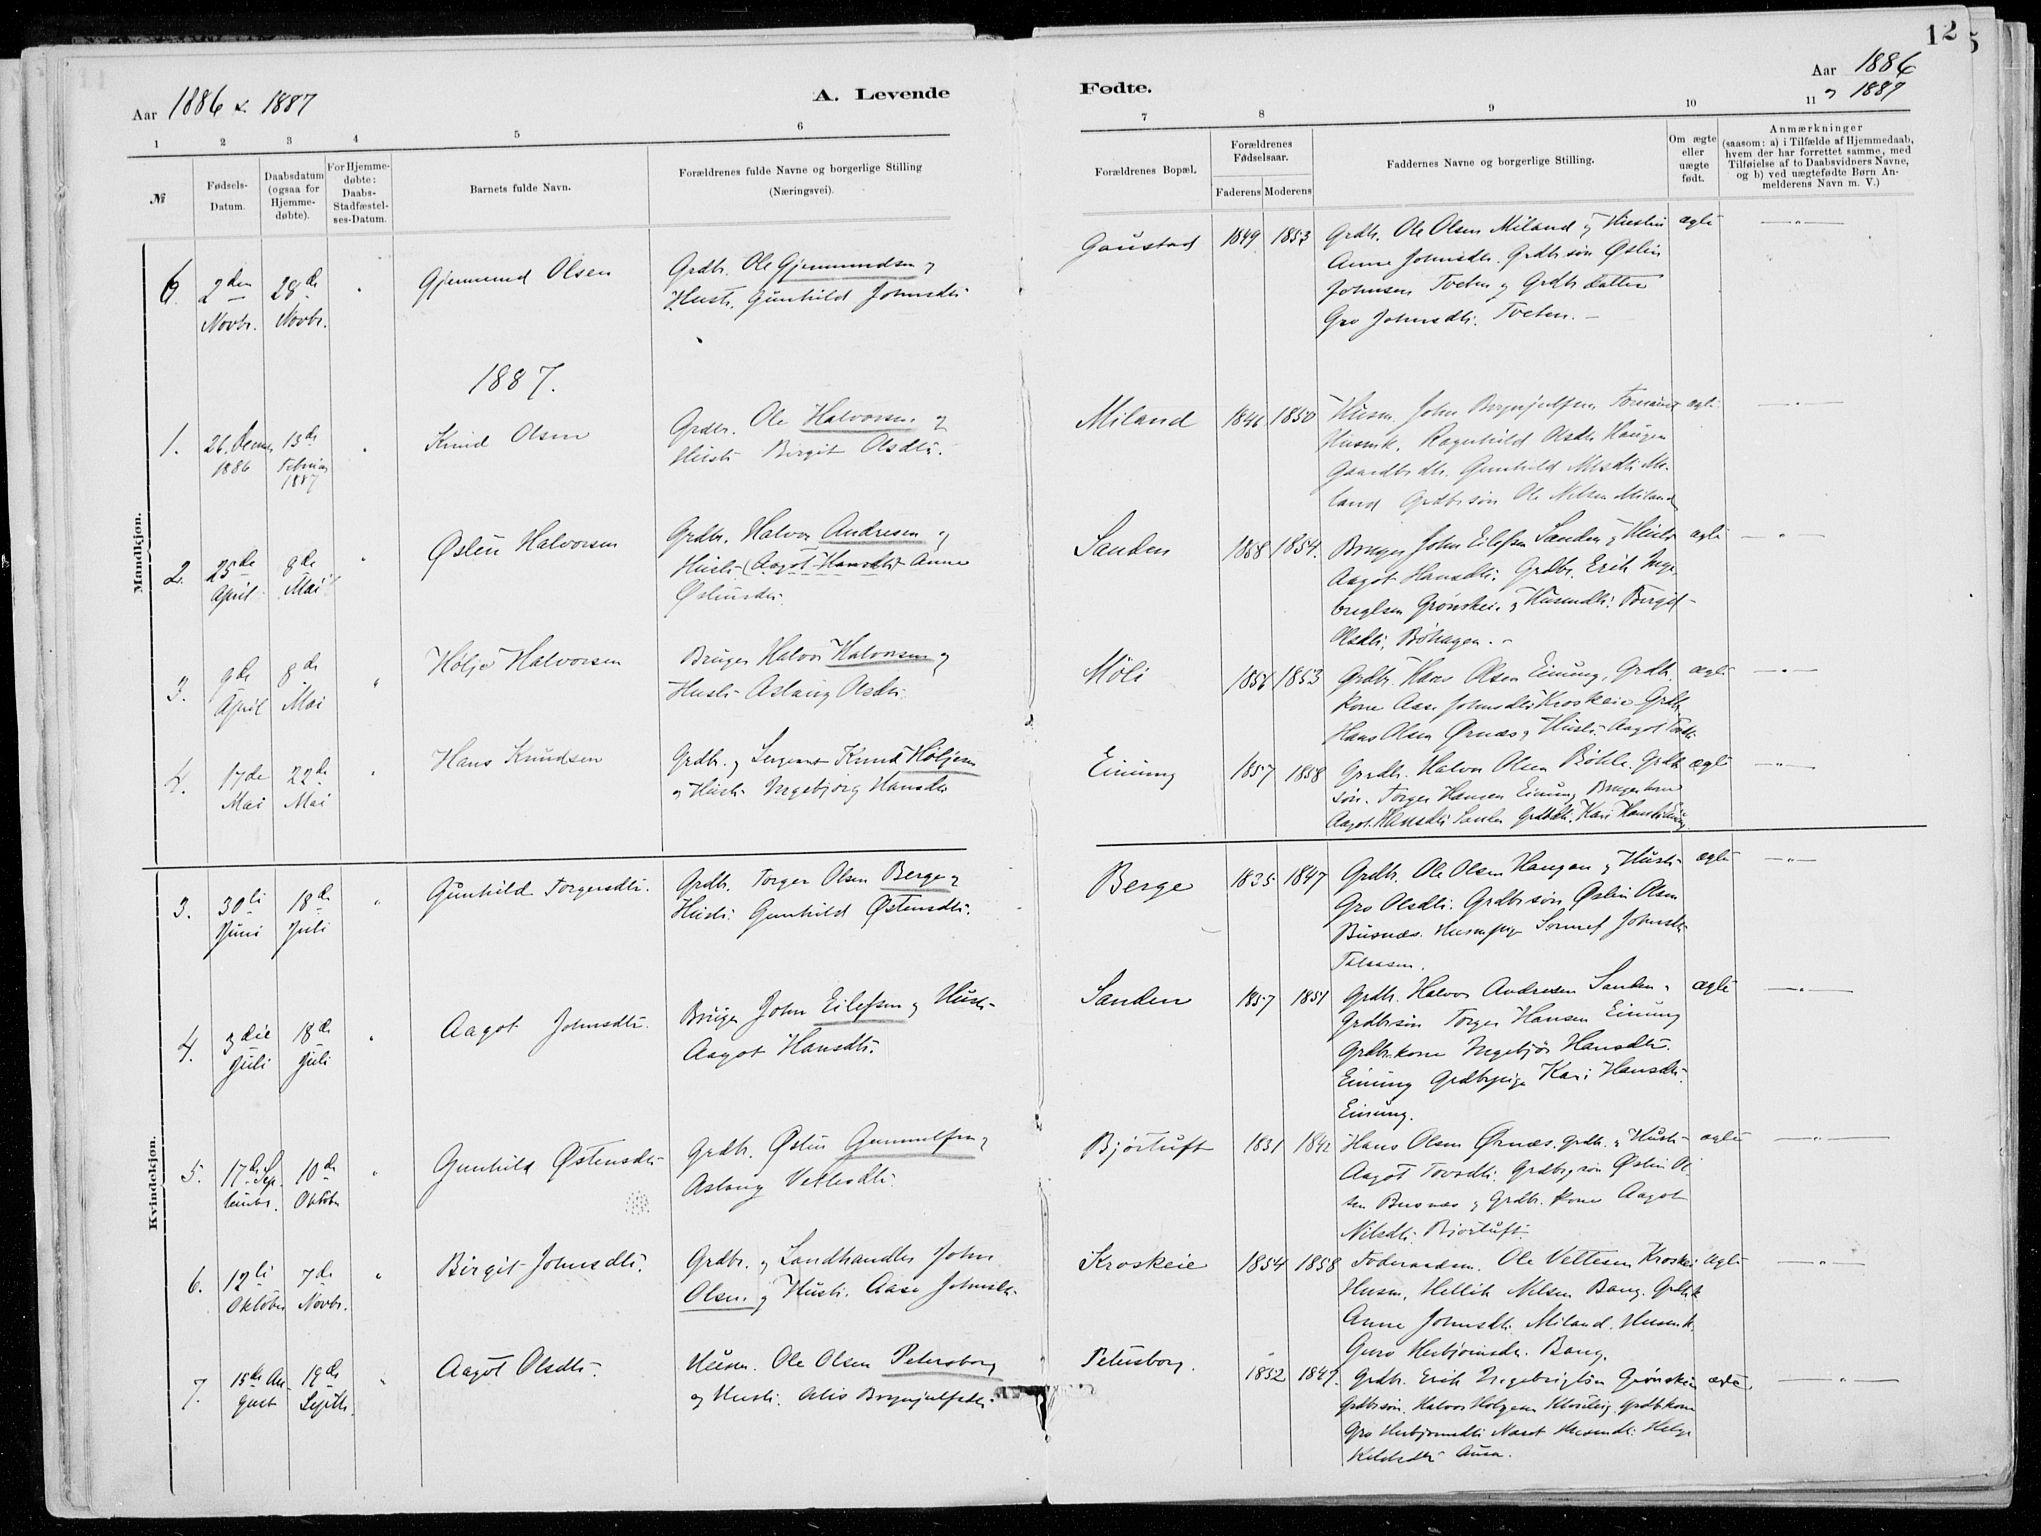 SAKO, Tinn kirkebøker, F/Fb/L0002: Ministerialbok nr. II 2, 1878-1917, s. 12